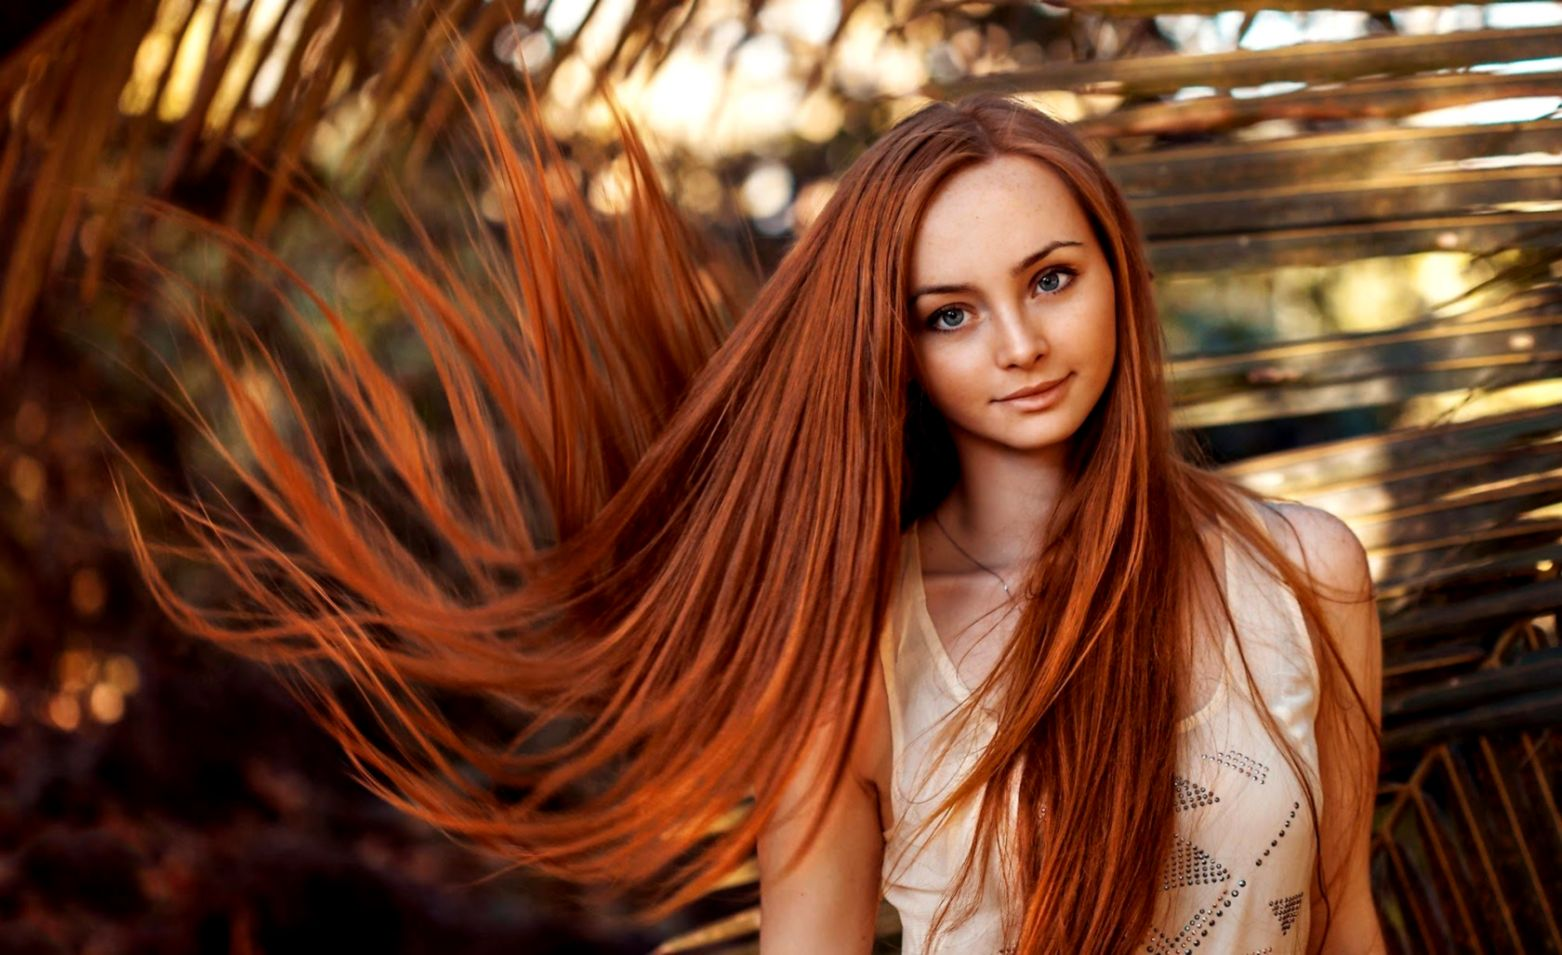 Lovely Girl Redhead Hd Wallpaper Wallpapers Desktop